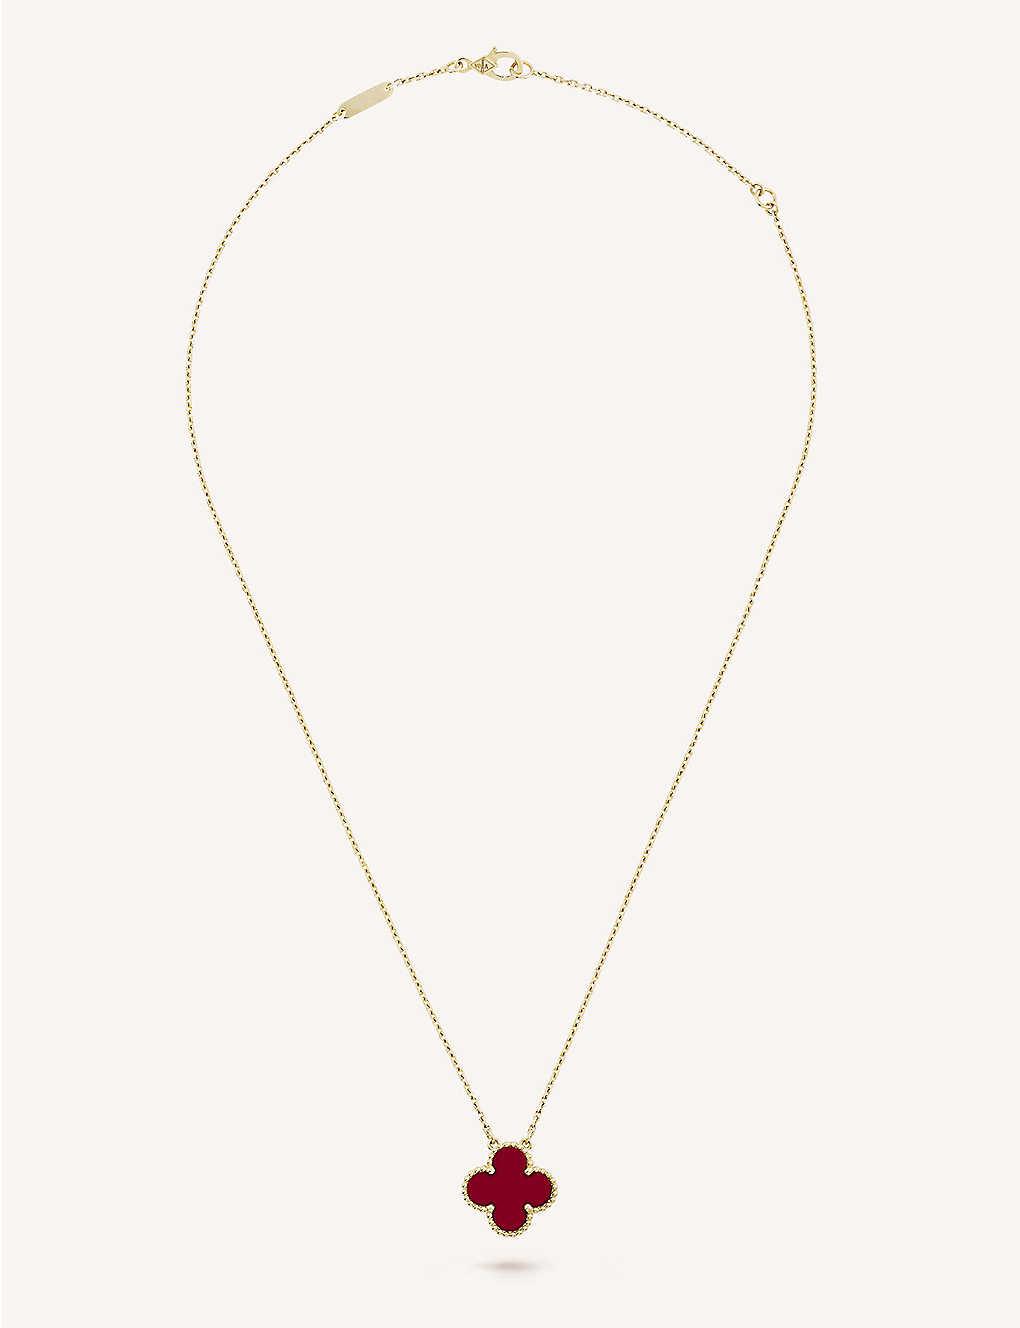 ac660b65f9 VAN CLEEF   ARPELS - Vintage Alhambra gold and carnelian pendant ...